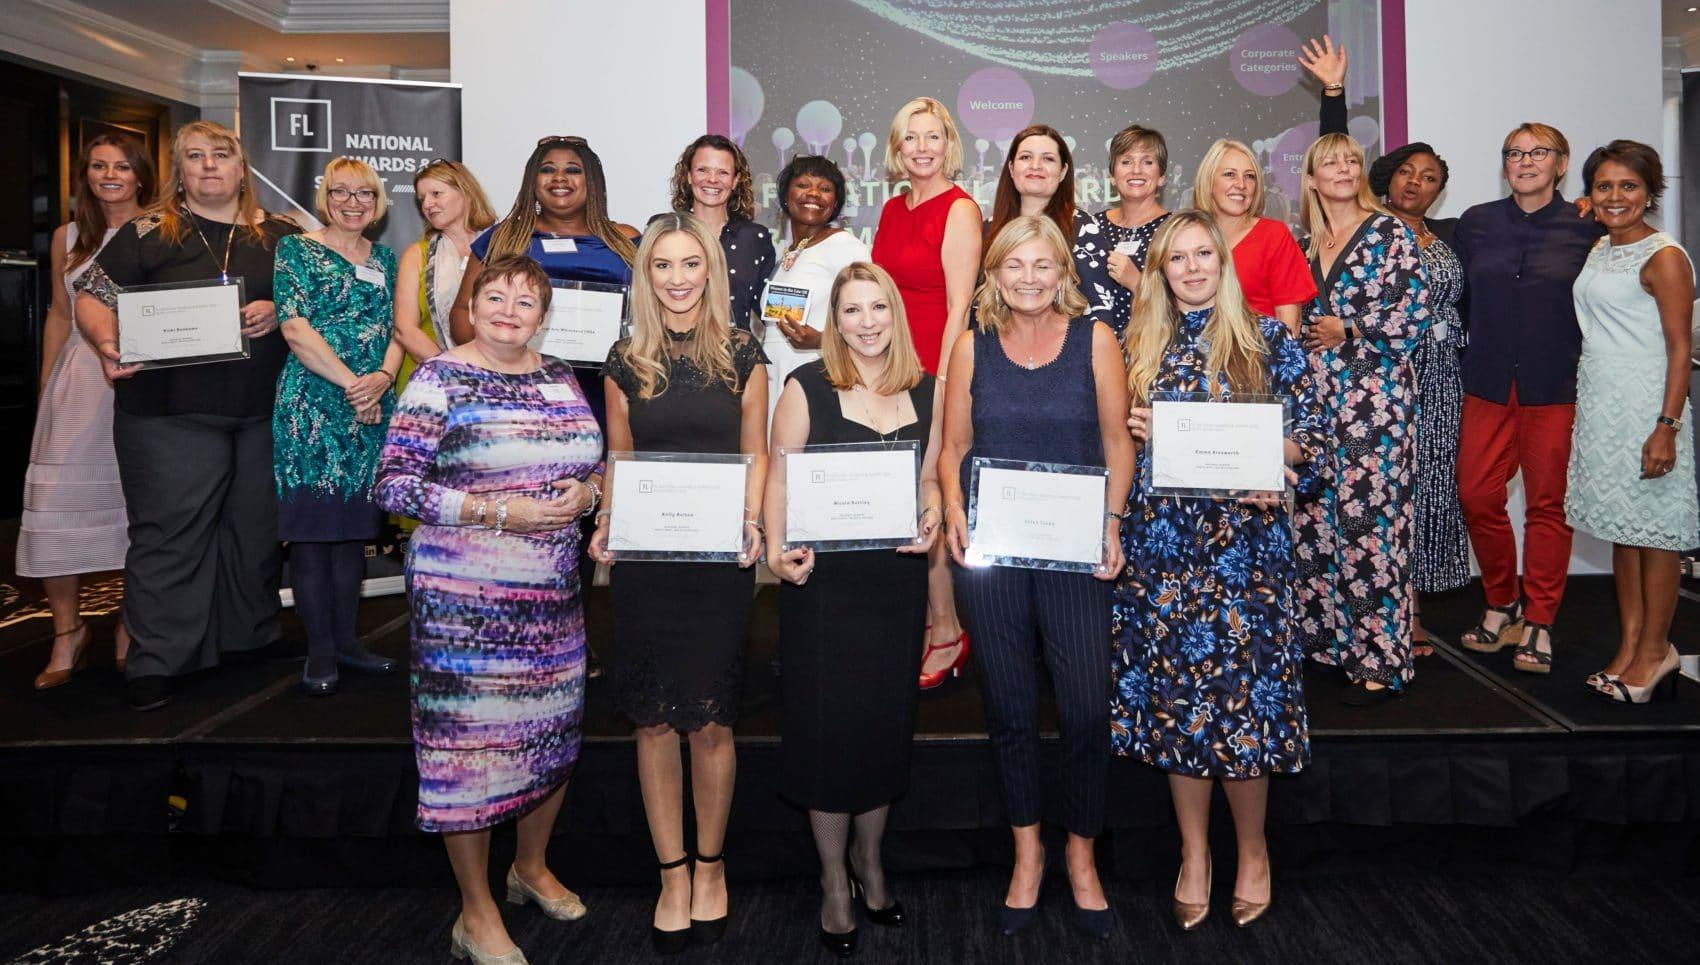 FL National Awards & Summit – North West, Wales & Ireland Regional Winners